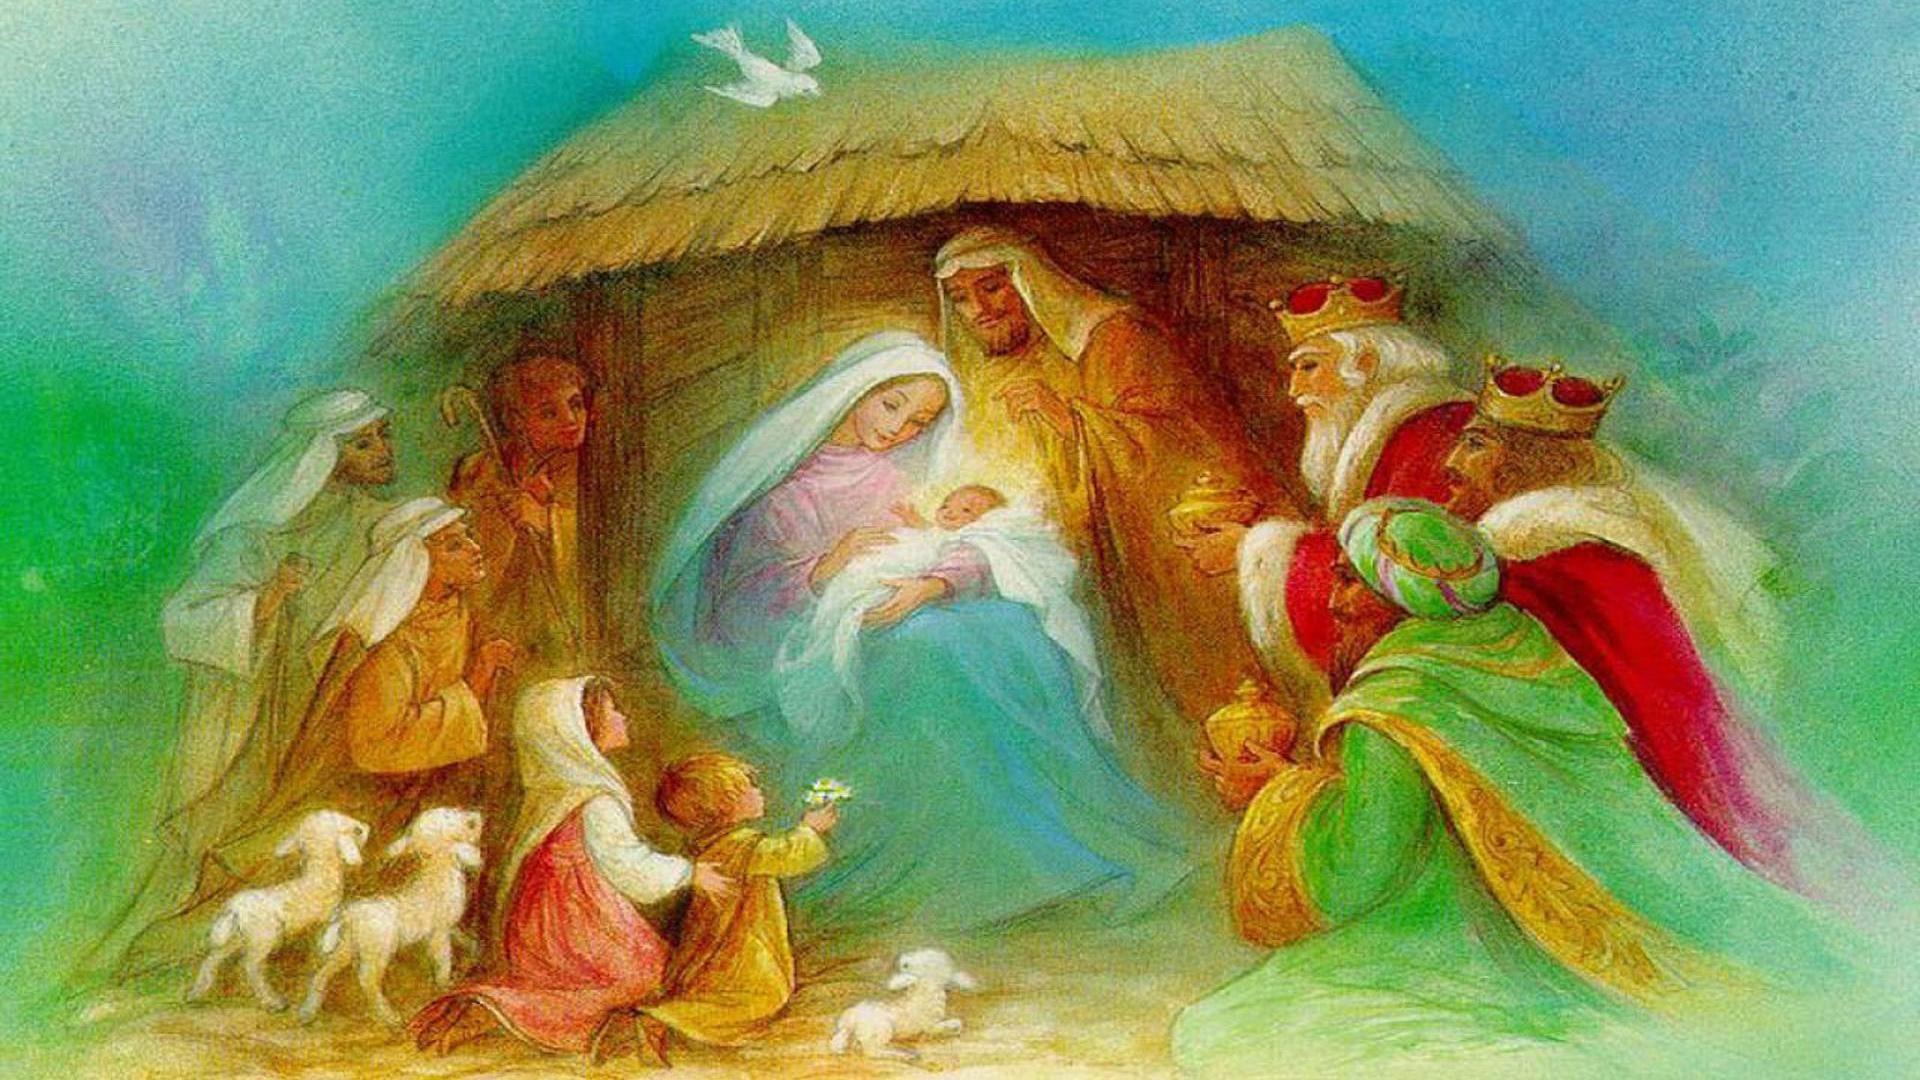 1920x1080 Christmas Nativity Wallpaper Download 2550x1440 Share